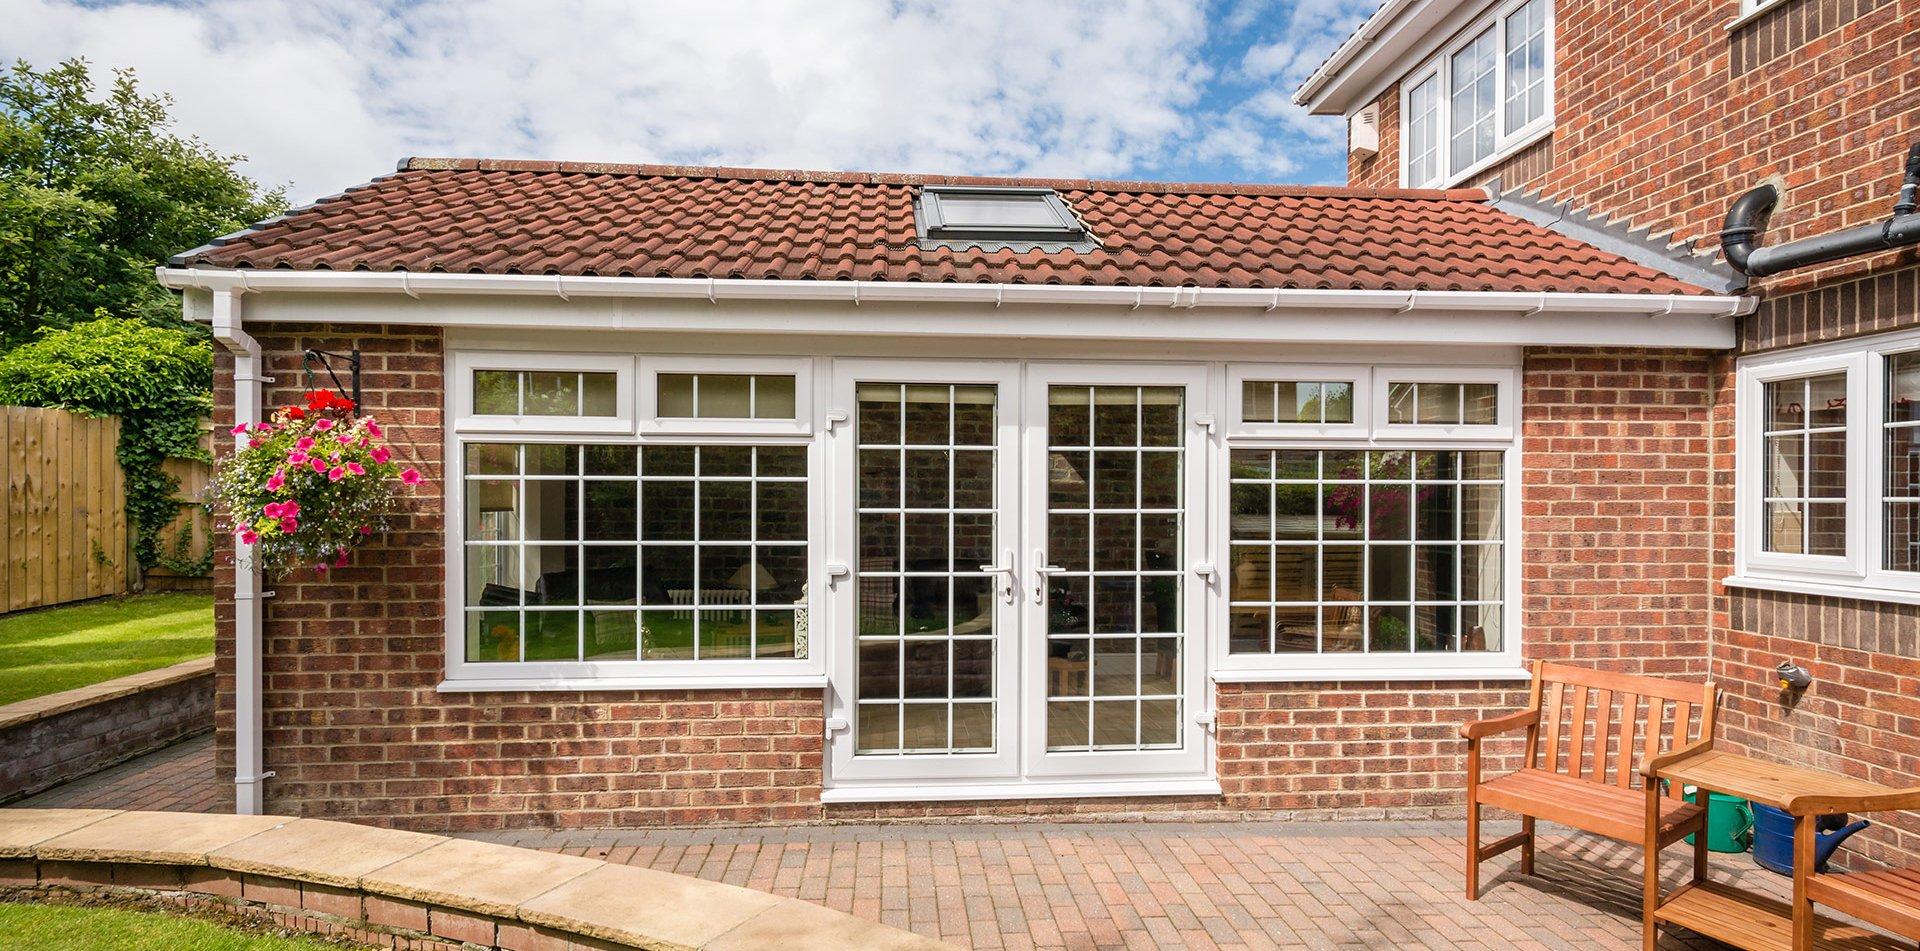 double glazing conservatory